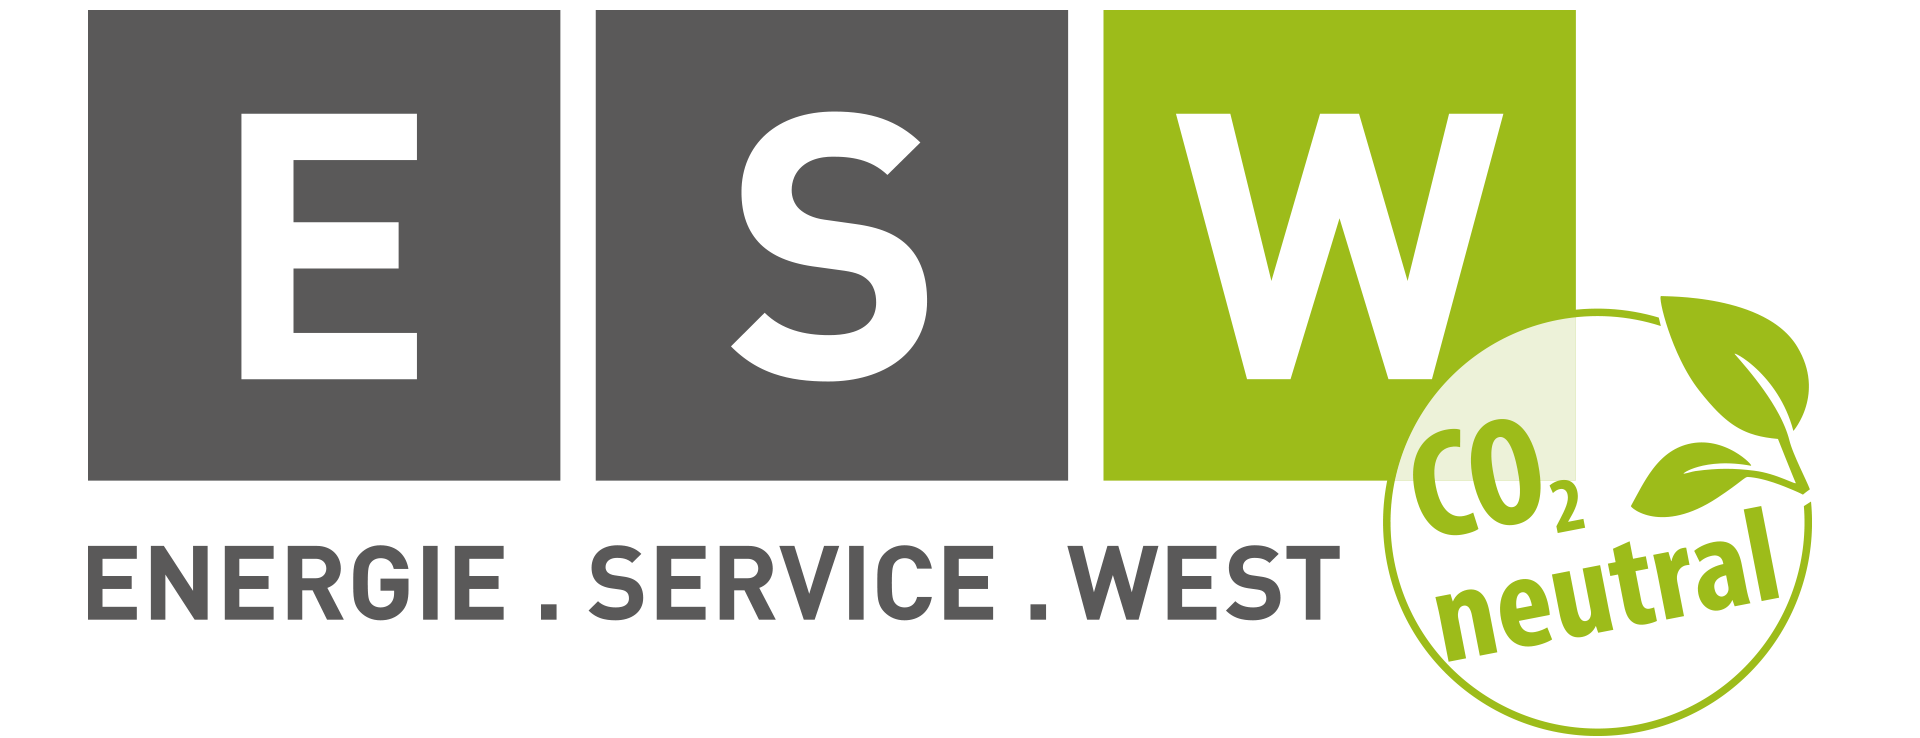 logo_esw.png